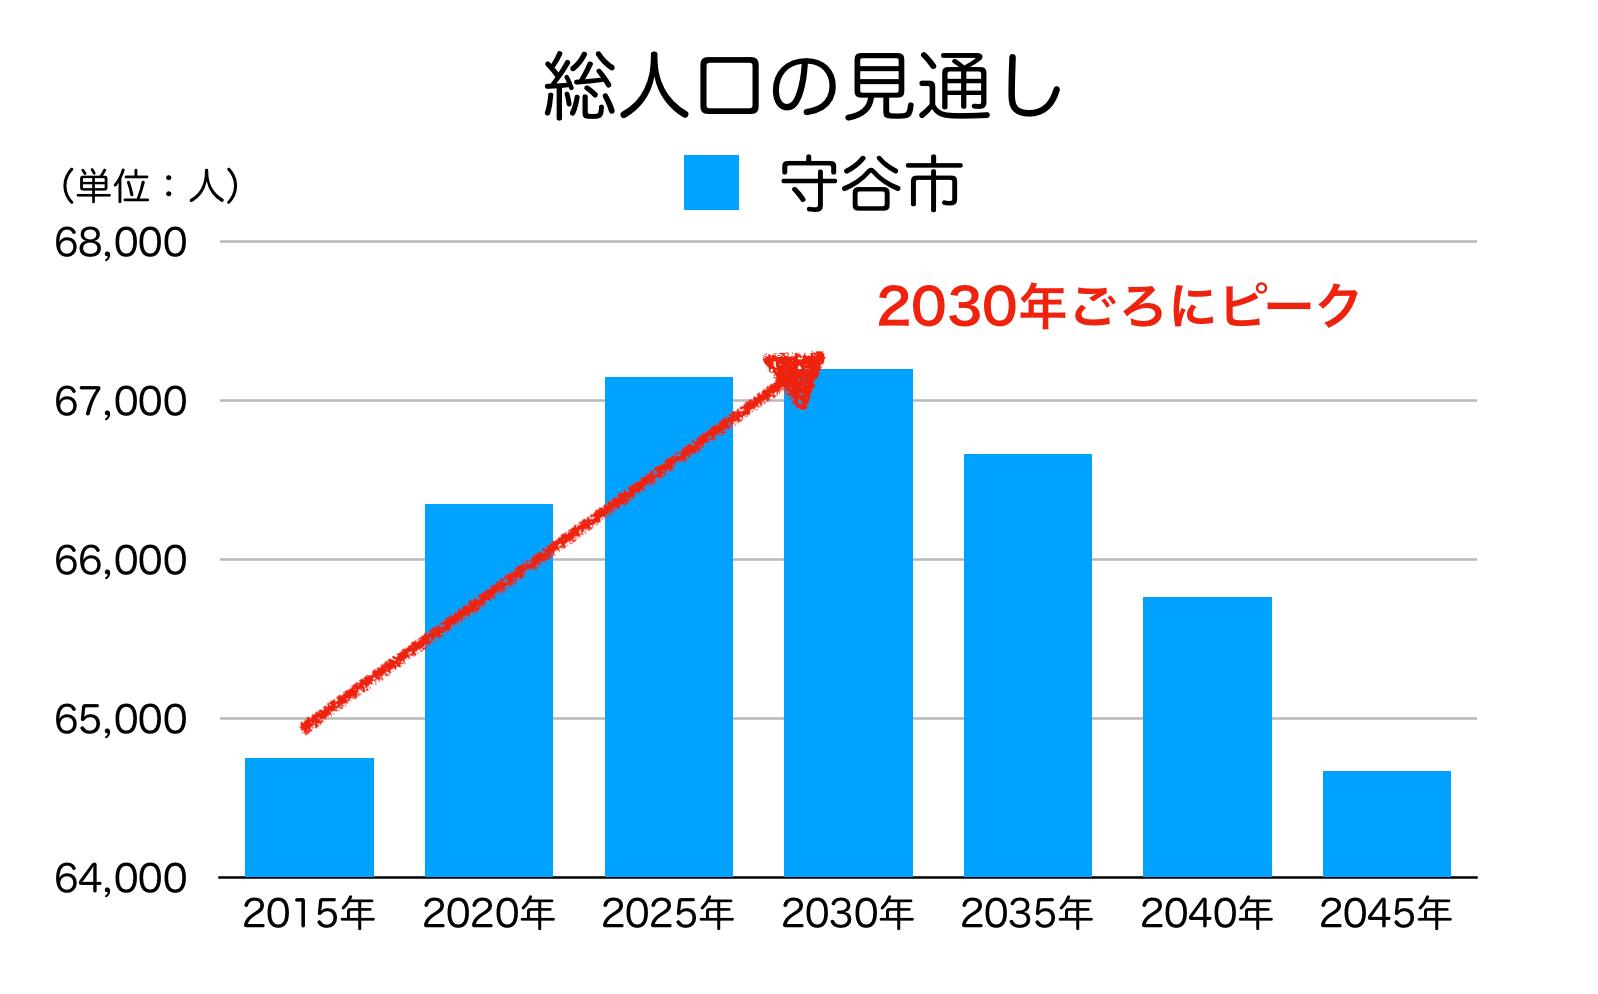 守谷市の人口予測